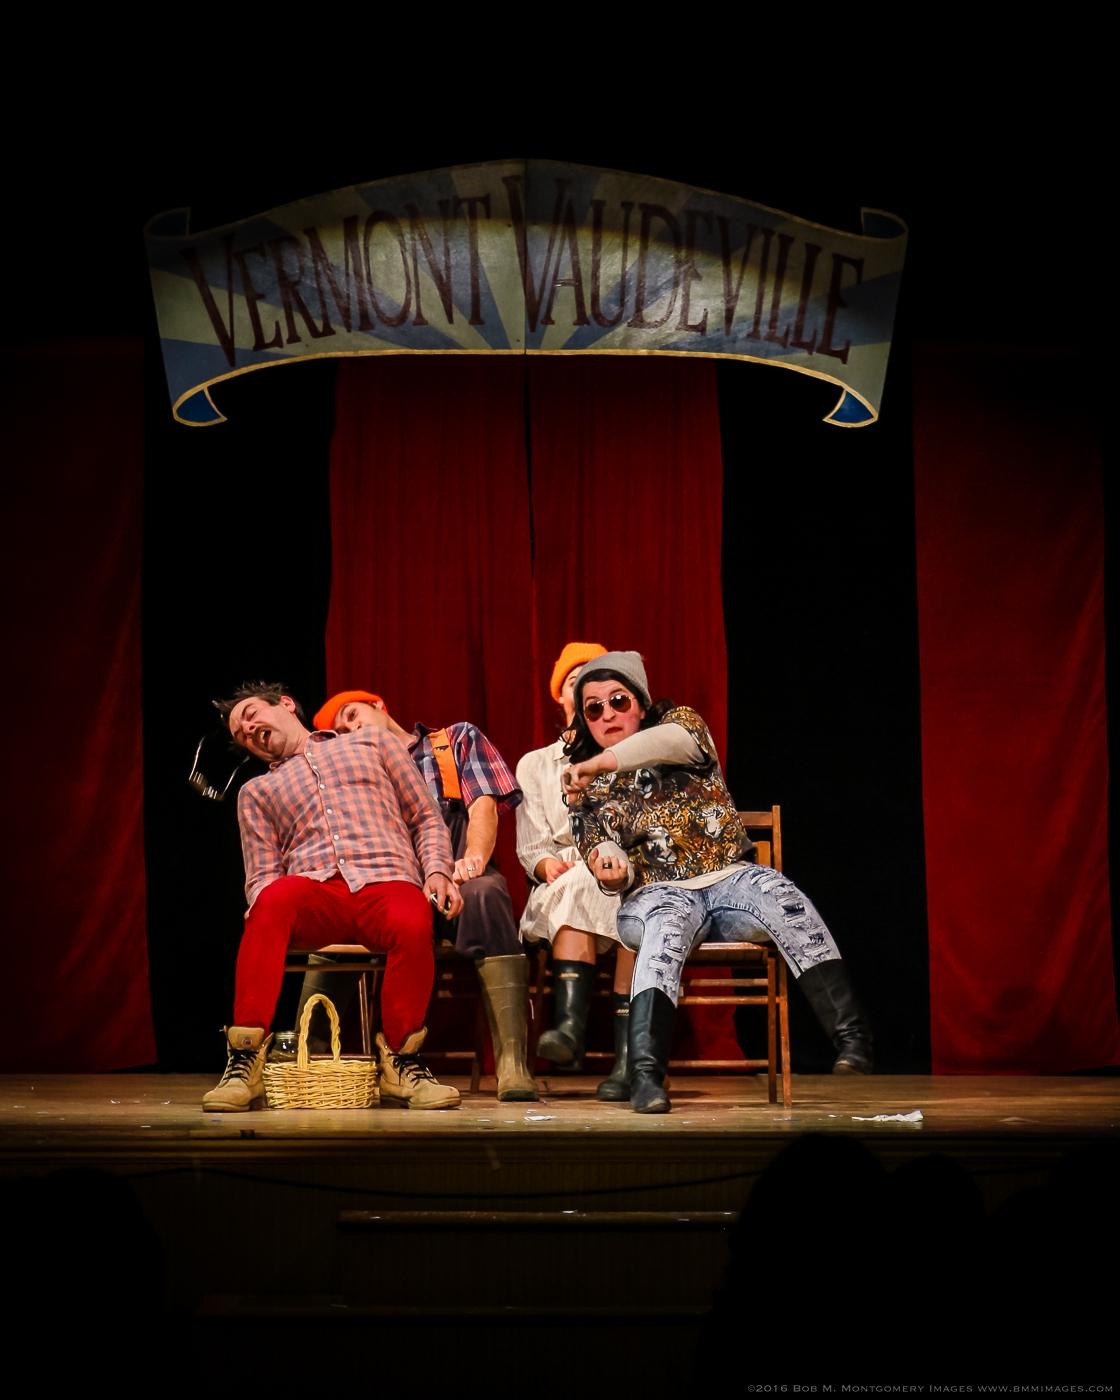 Vermont Vaudeville 20160513 - 0106.jpg